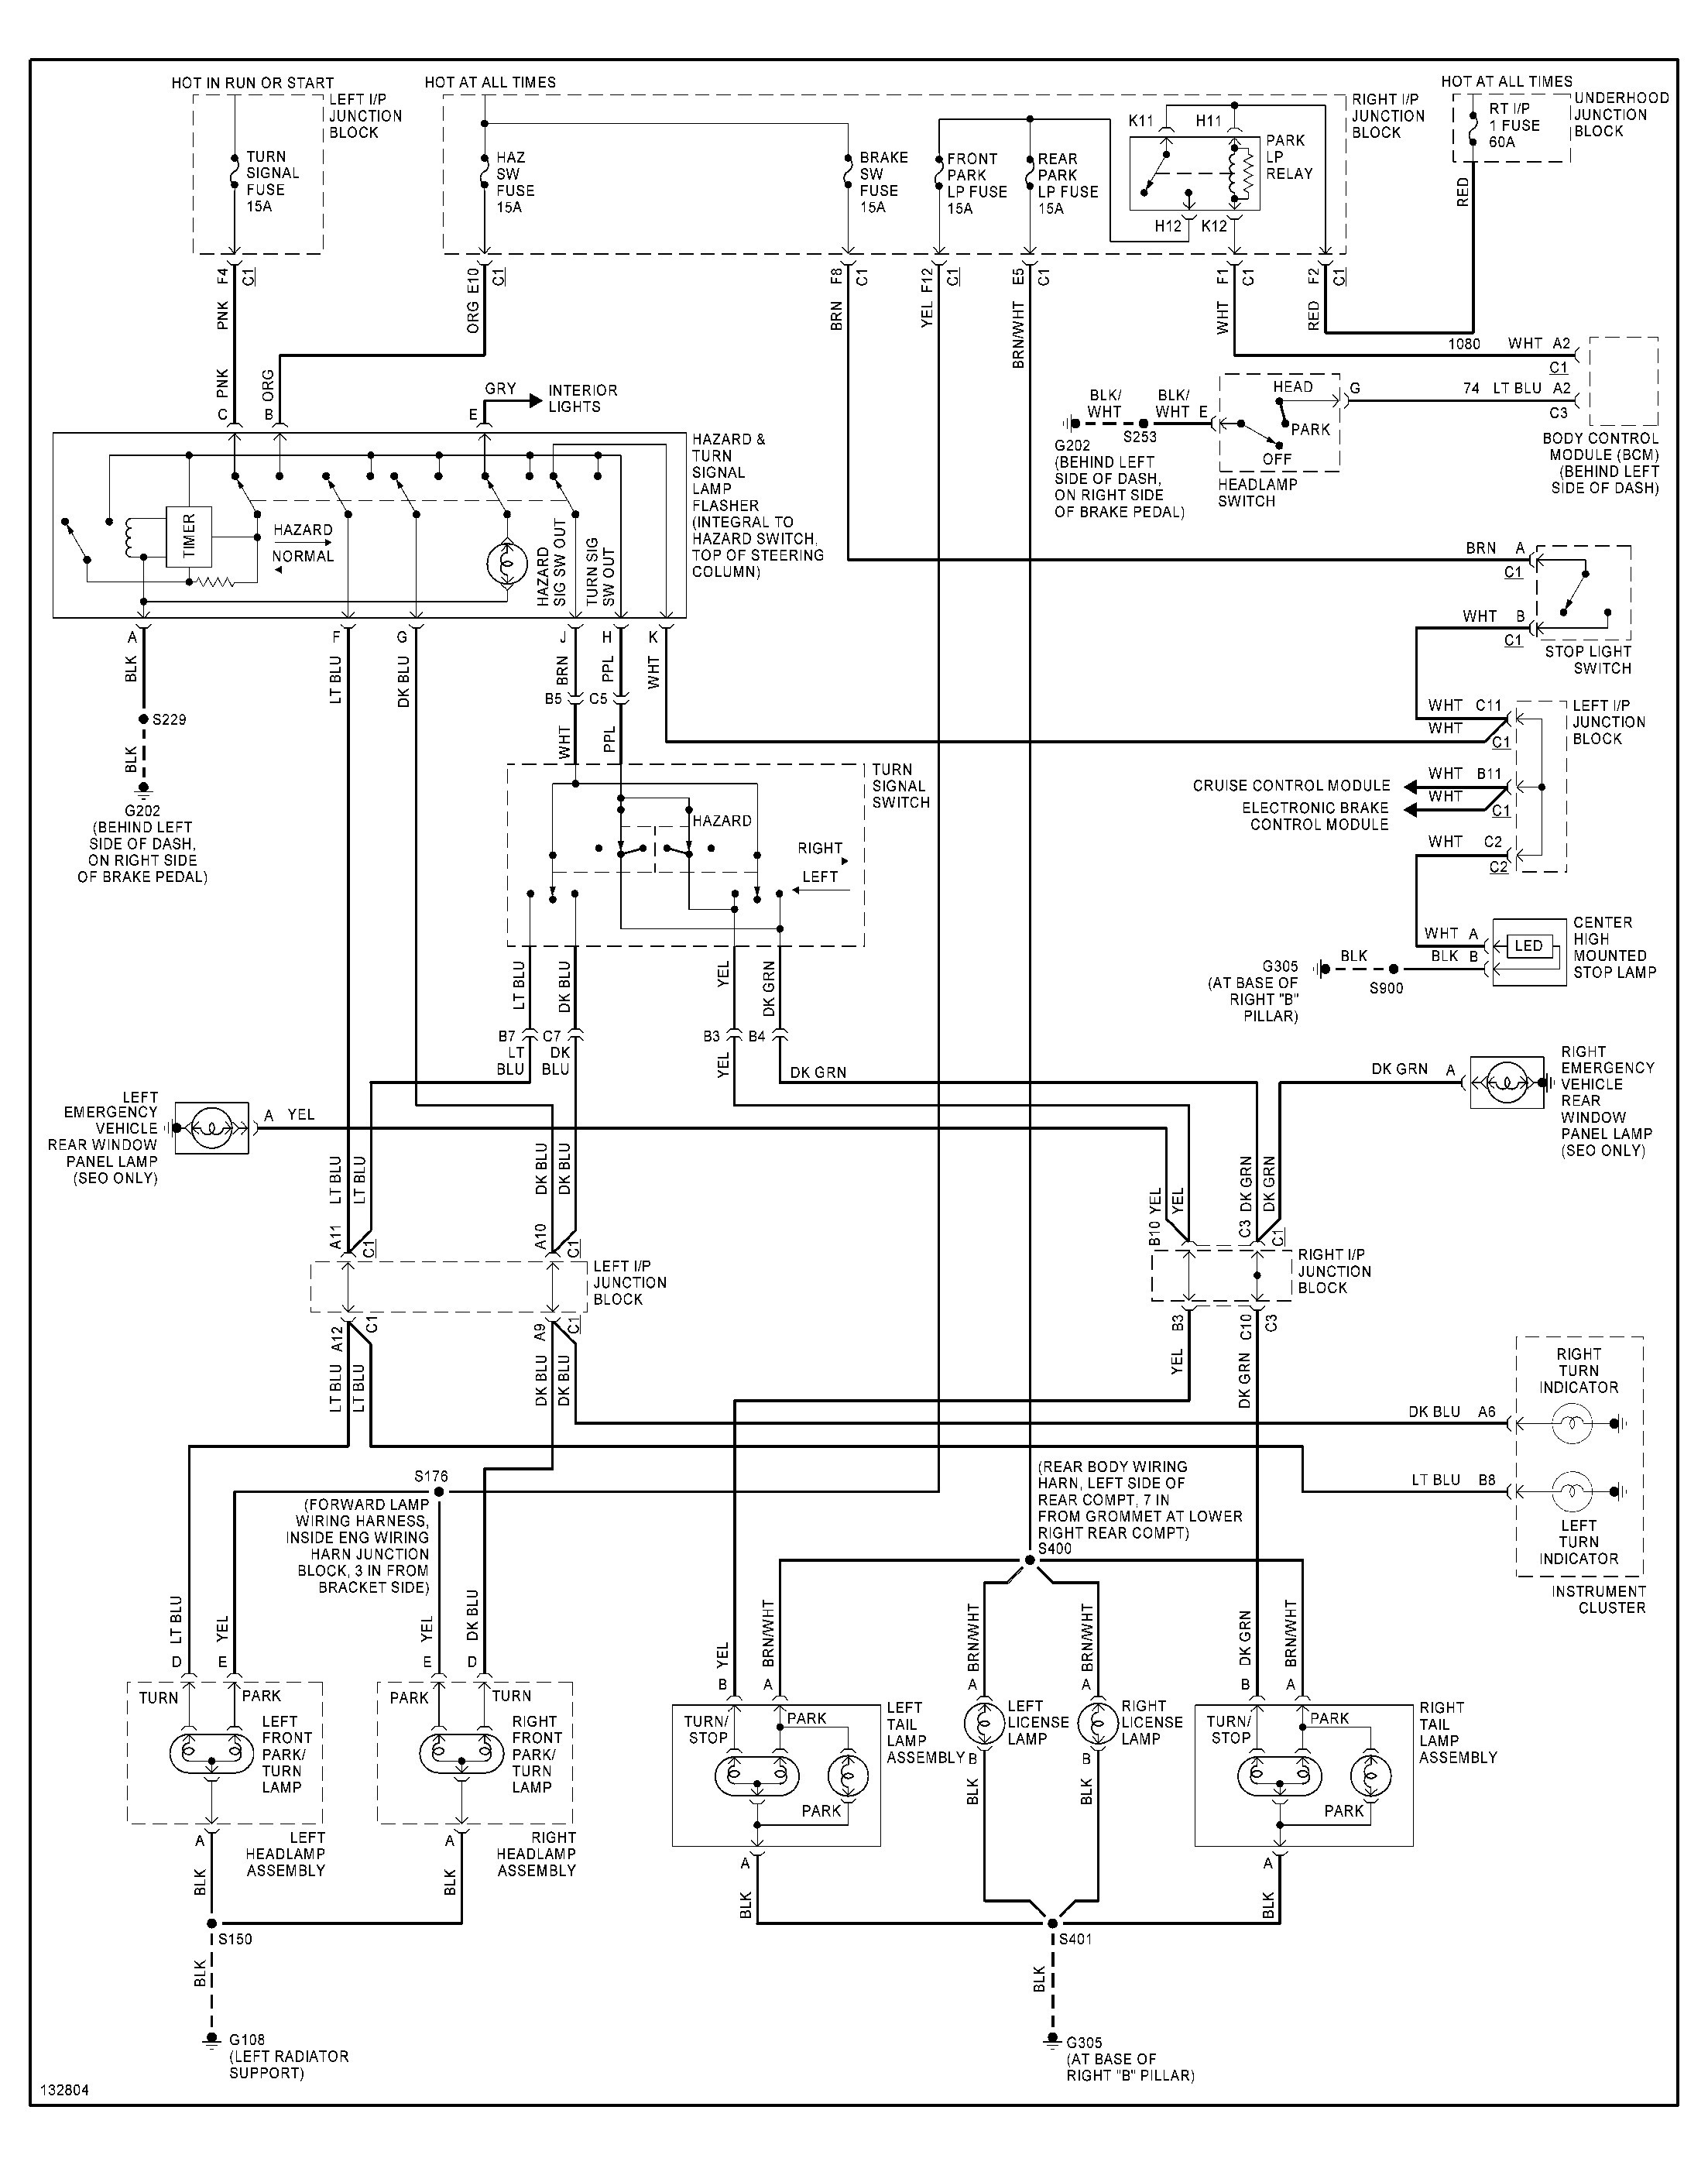 2001 chevy impala 3 8 engine diagram 2008 chevy impala